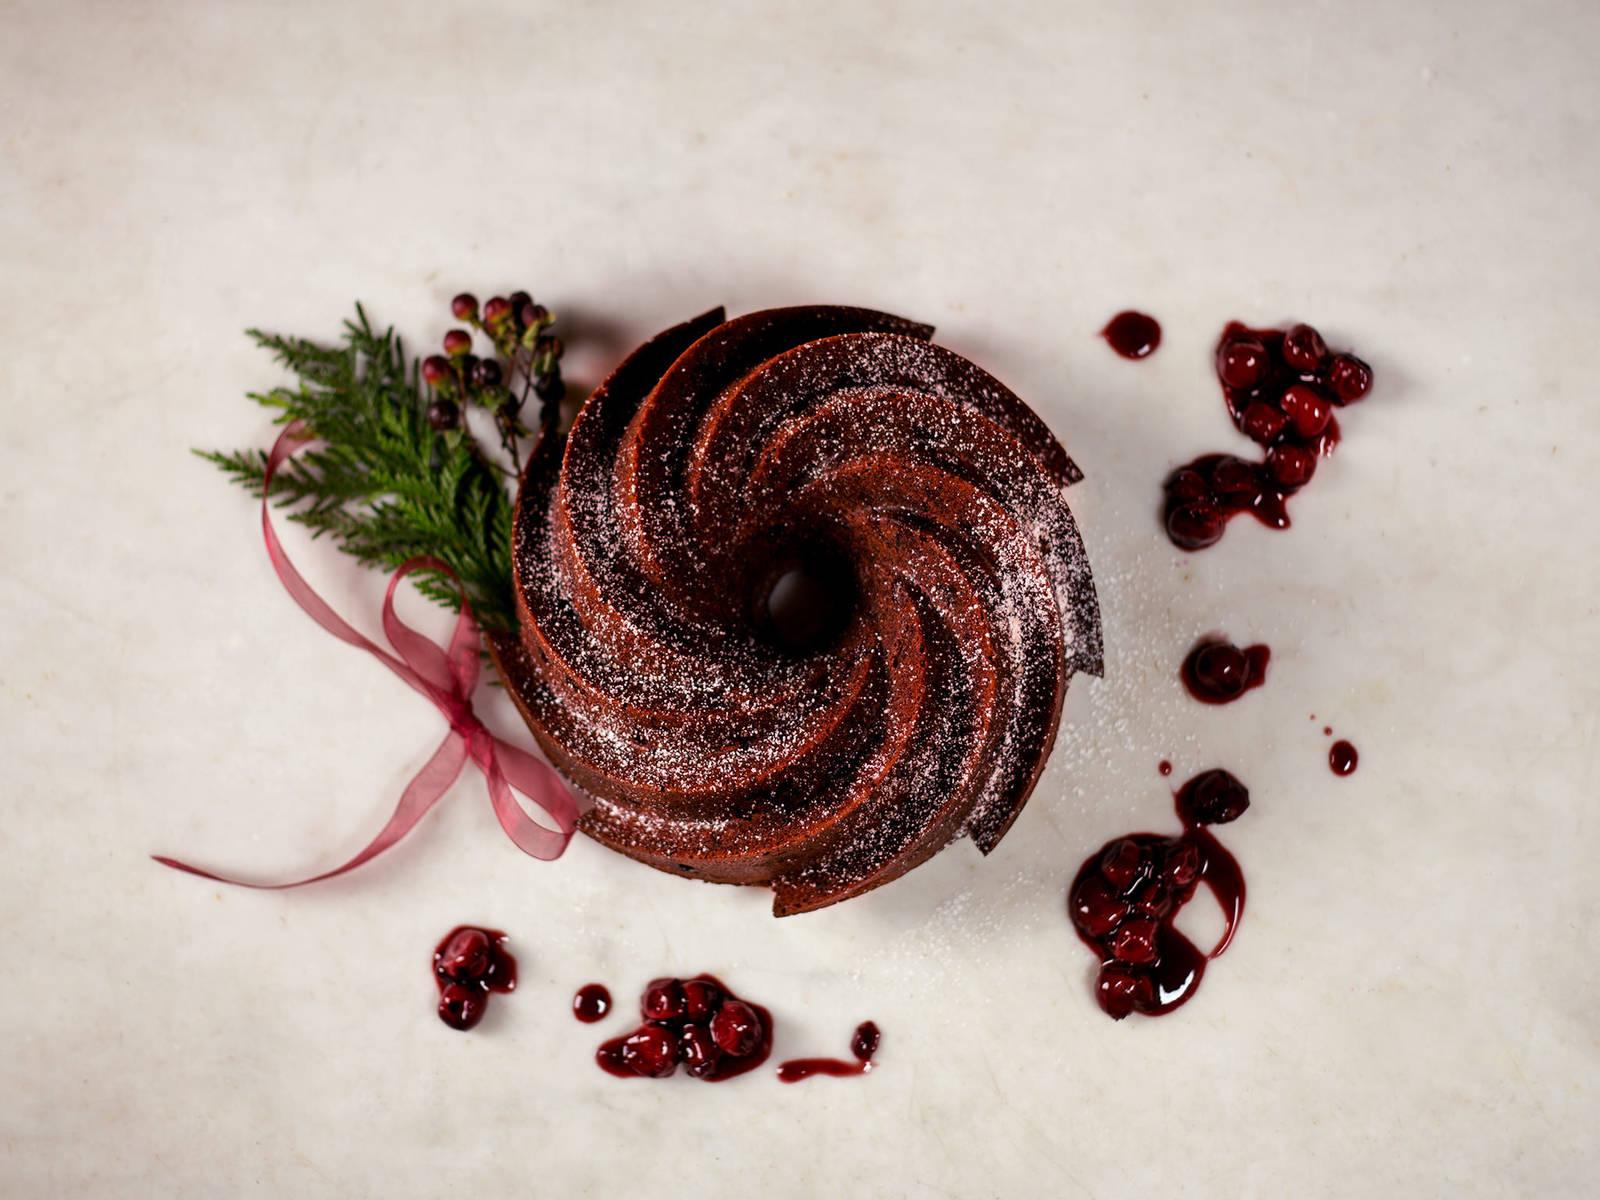 Schokoladen-Rum-Kirsch-Kuchen